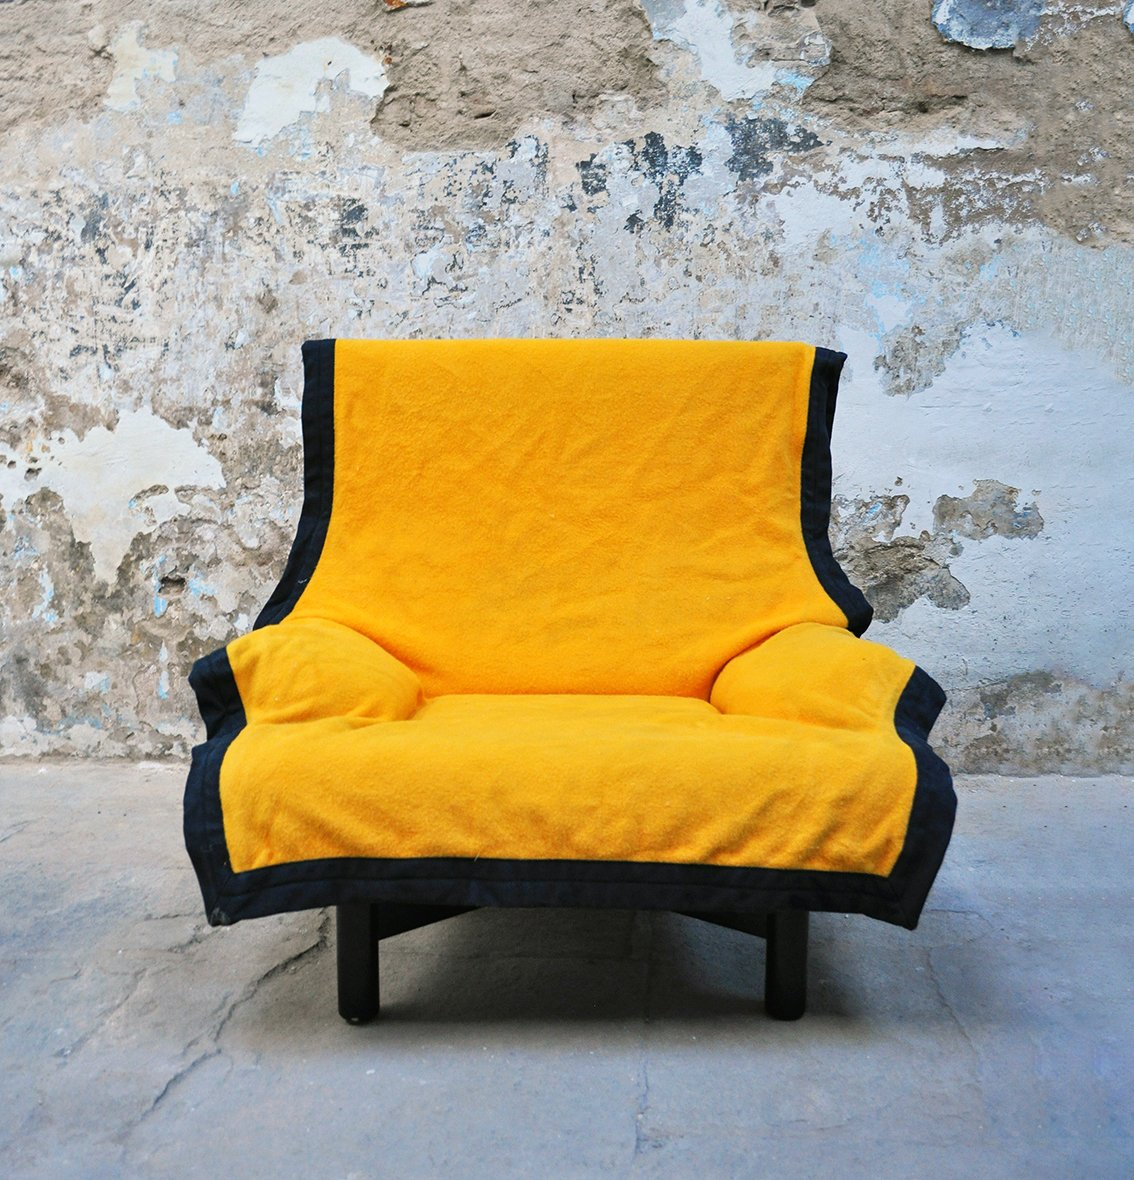 Vintage Sindbad Sessel von Vico Magistretti für Cassina